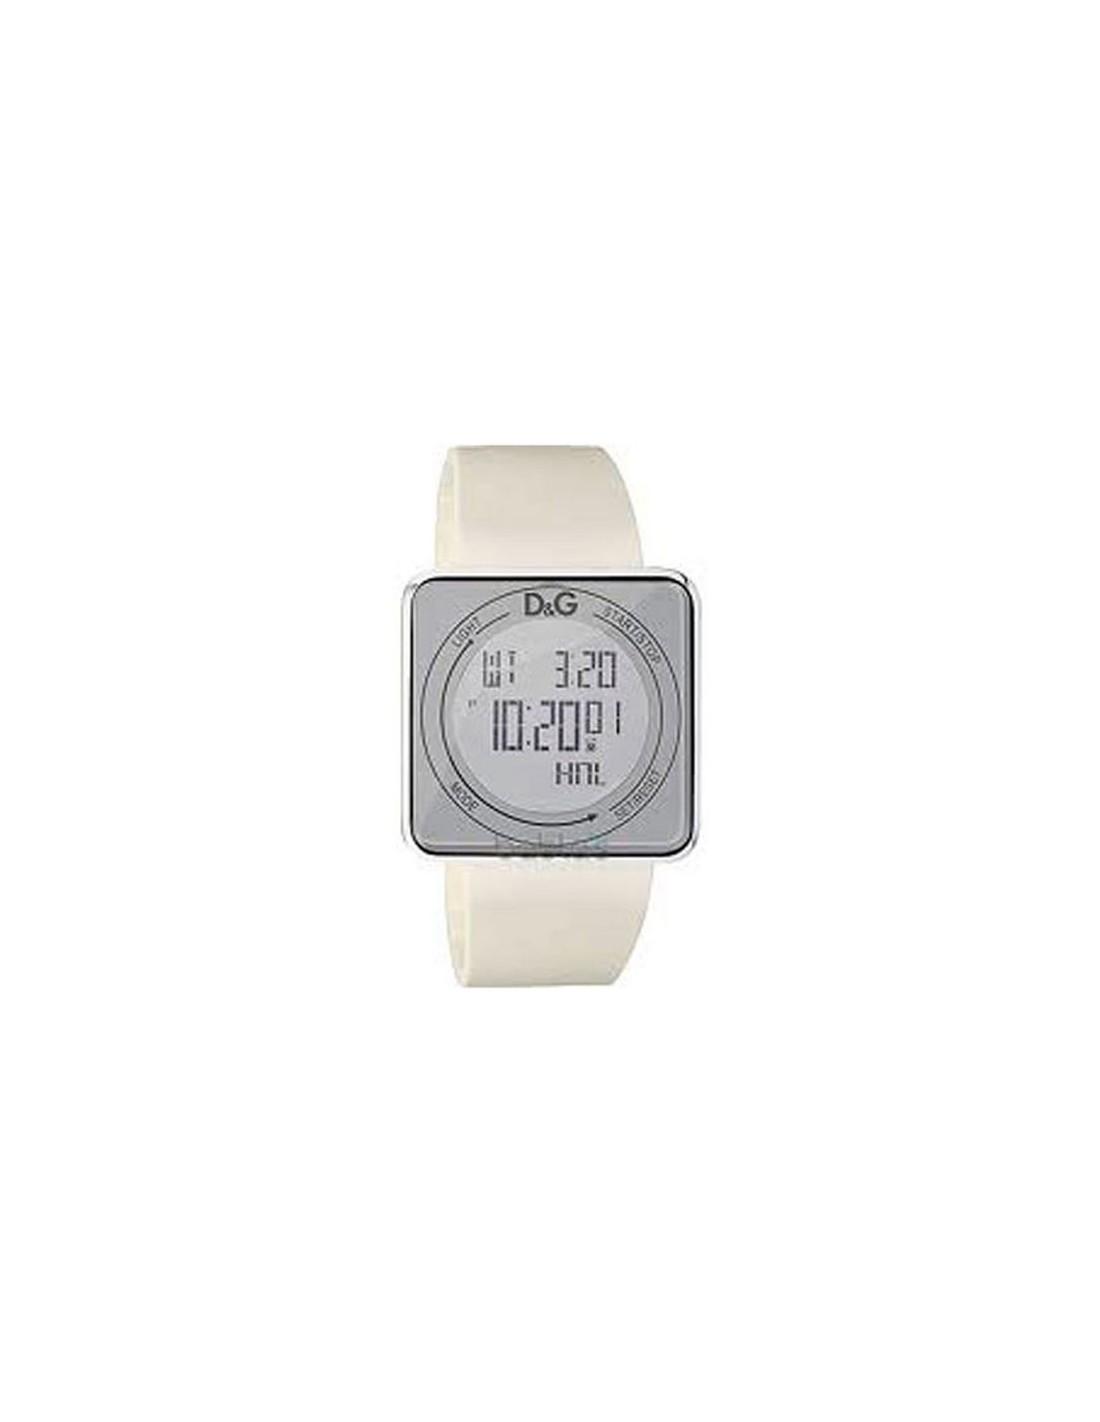 462c56b9f2 DW0735   Dolce Gabbana Watch DW0735 - Dolce Gabbana Watches